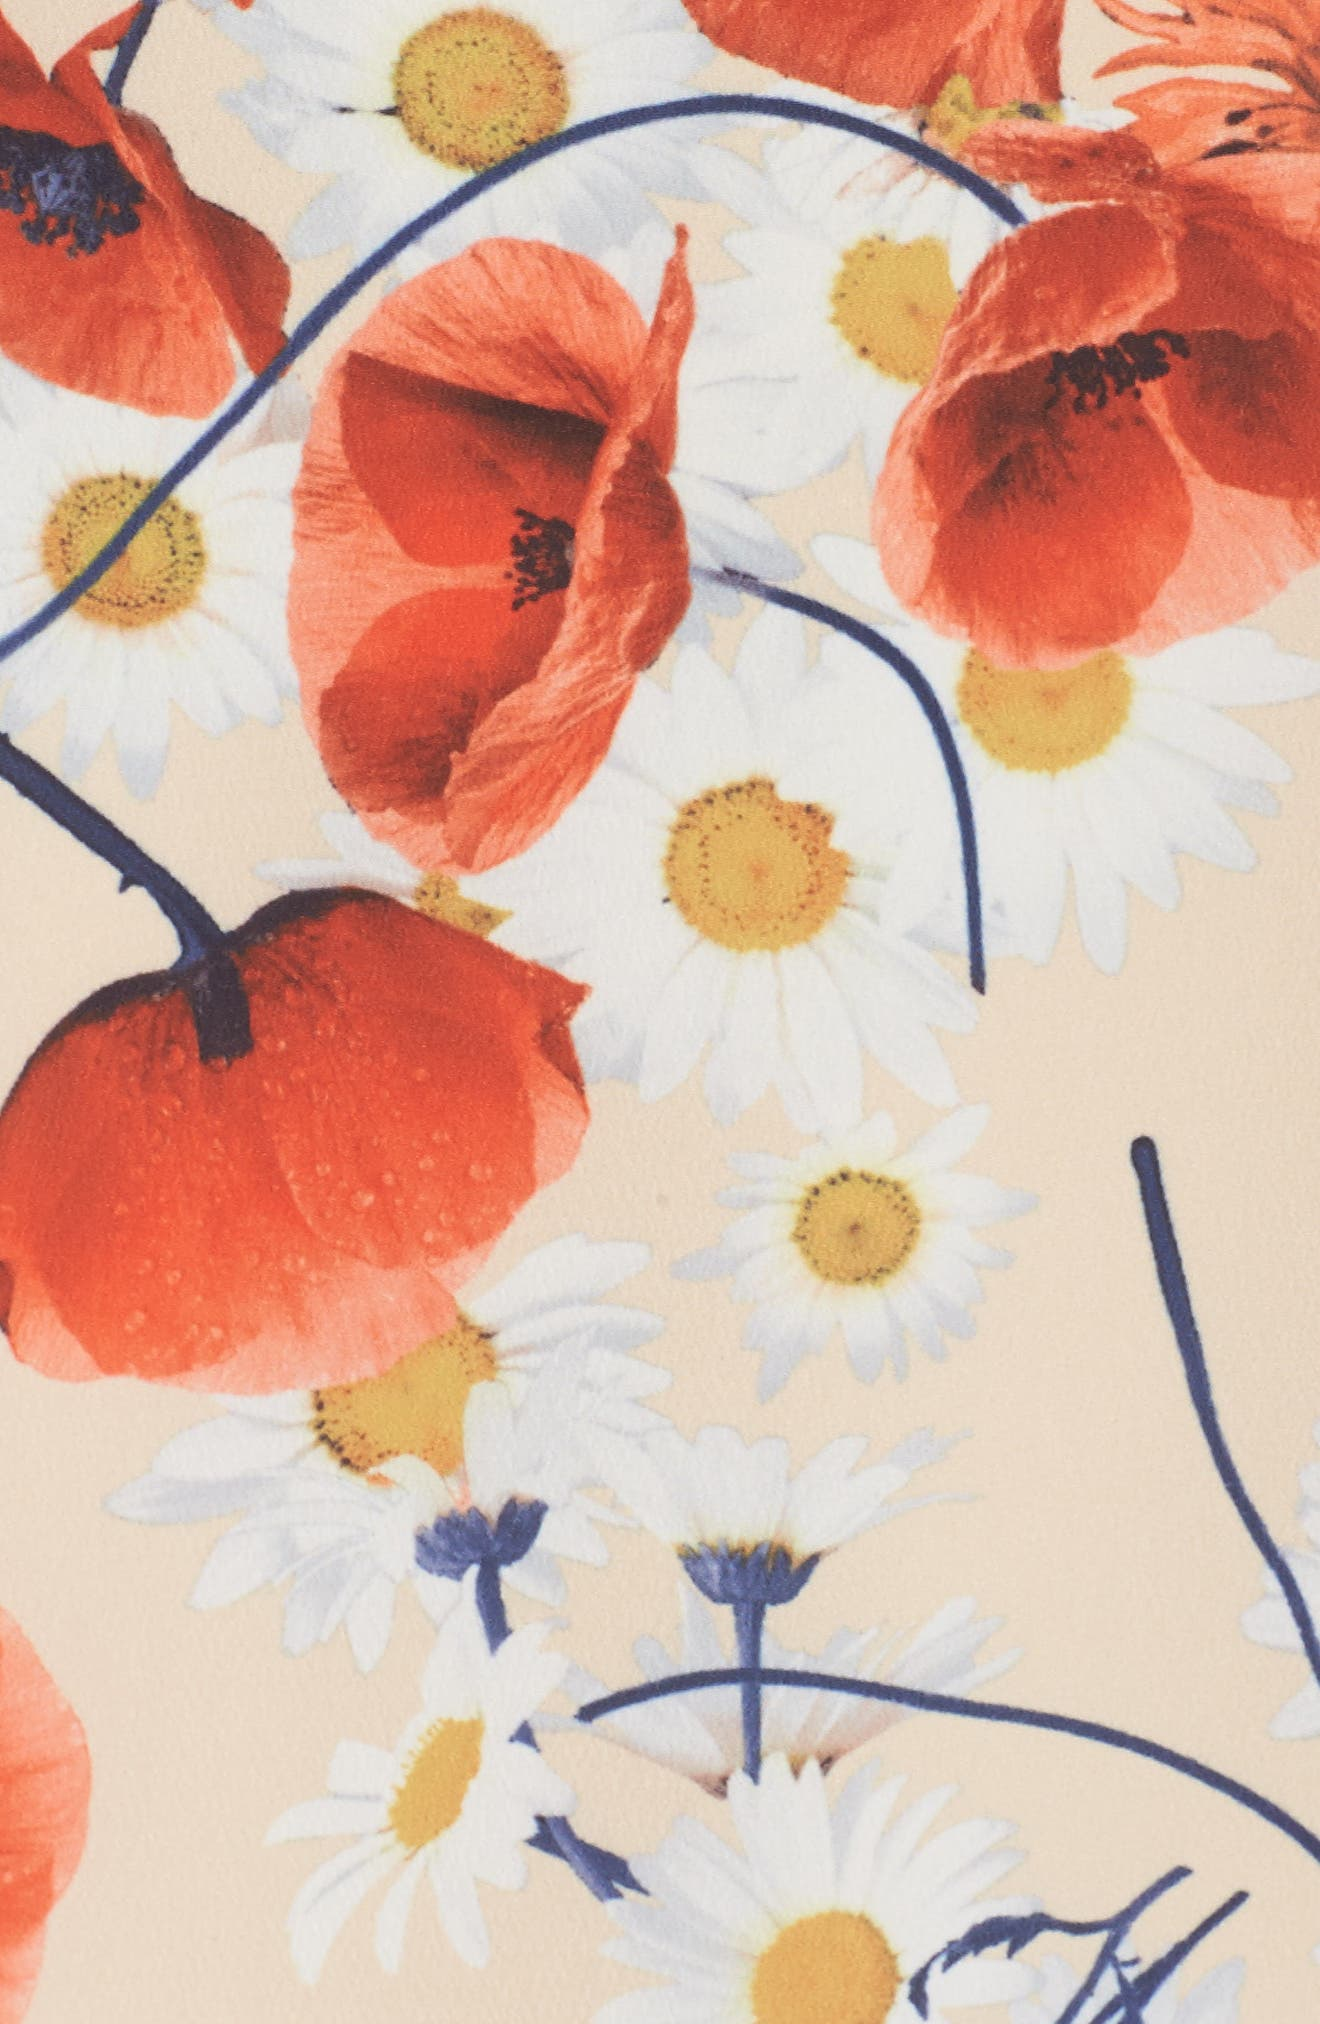 Lola Printed Poplin Dress,                             Alternate thumbnail 5, color,                             CORAL FLORAL